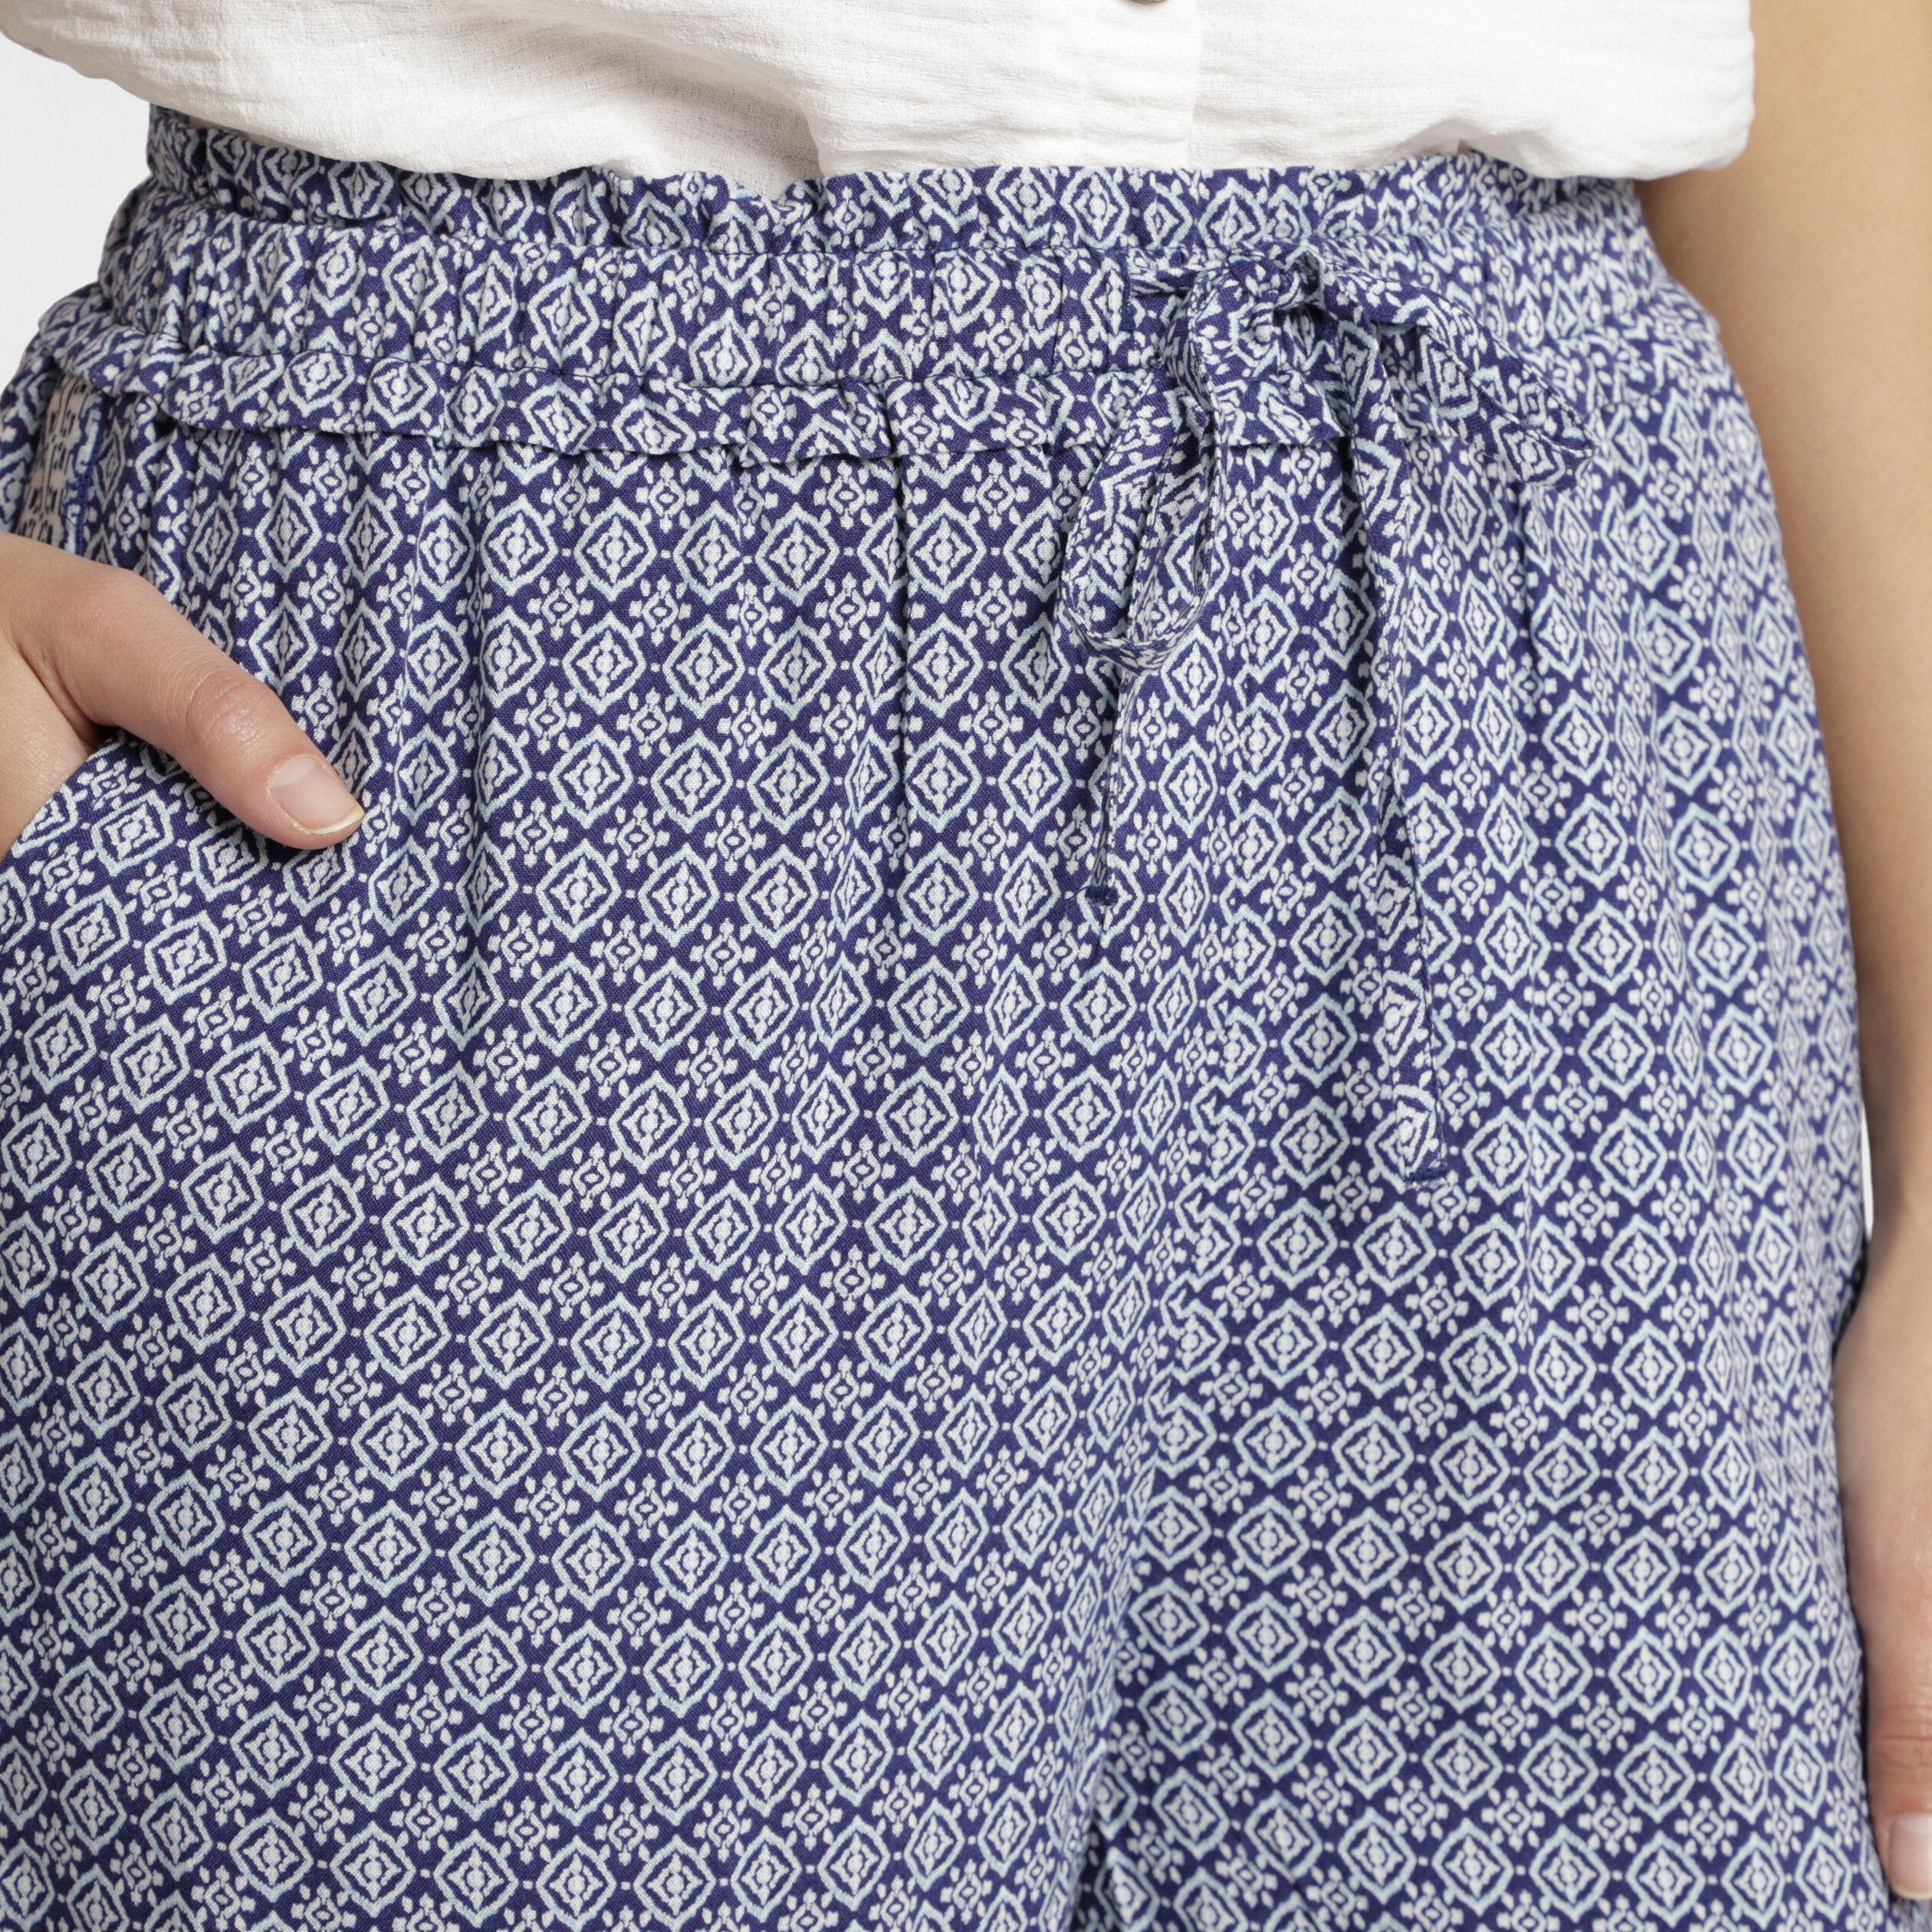 Marine Imprimé Côté Bande FemmeVib's Bleu Fluide Pantalon OknPw80